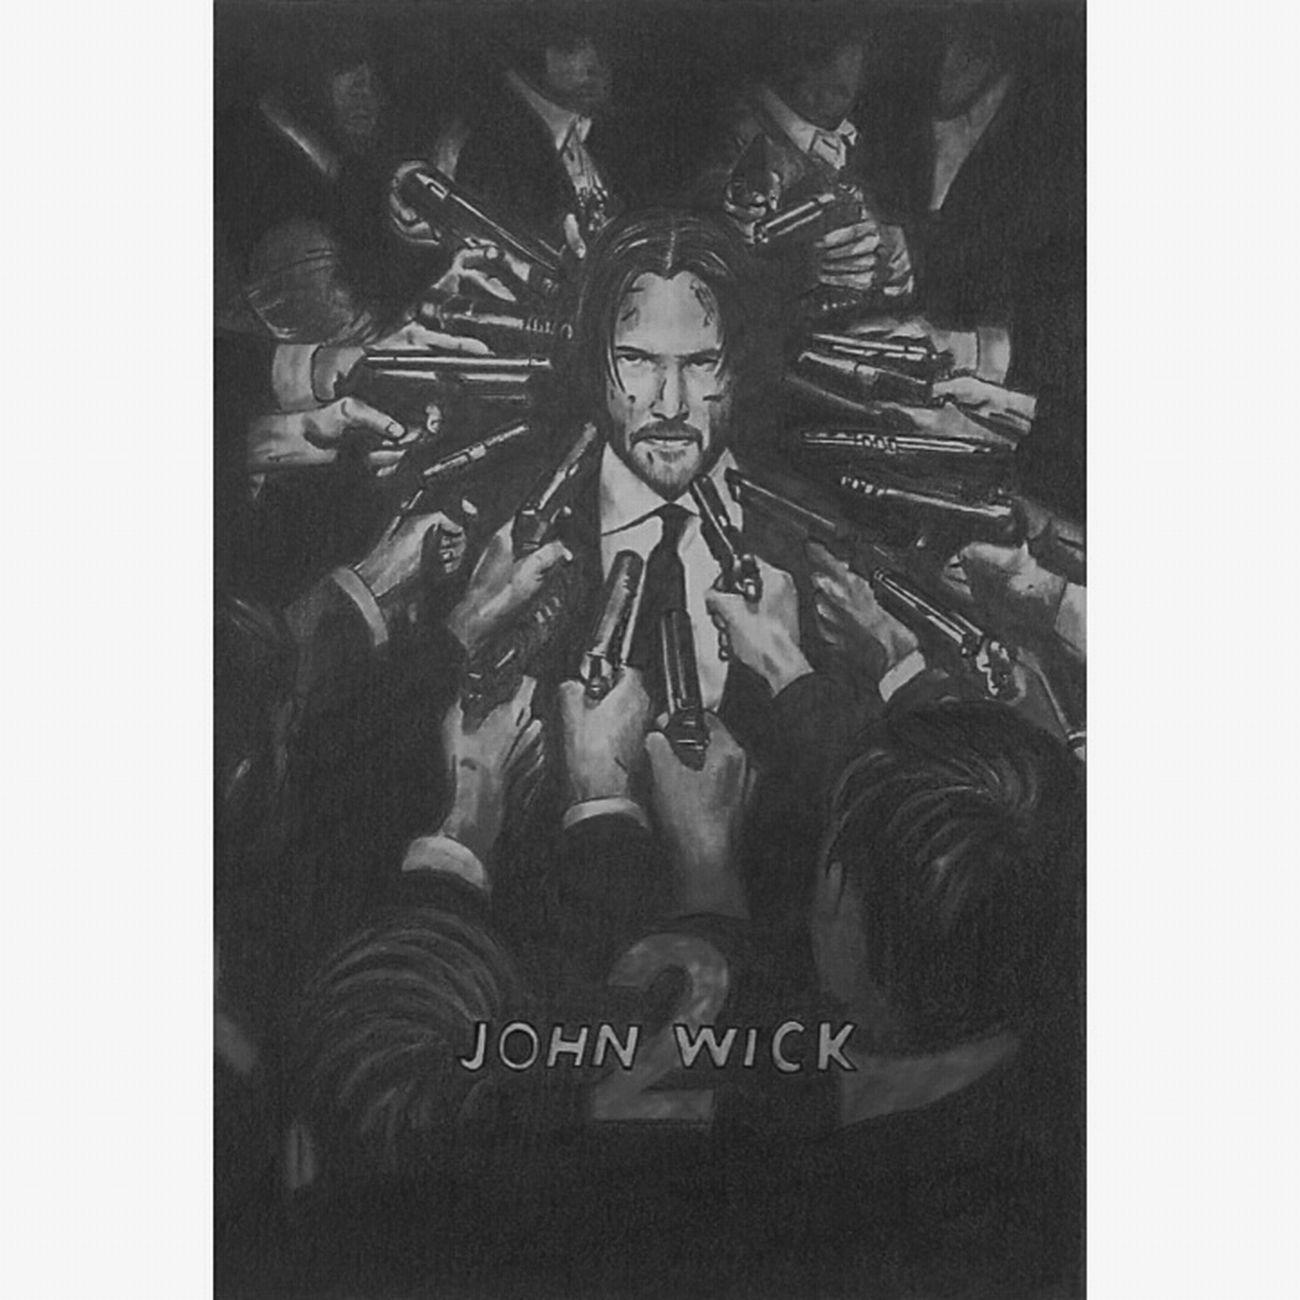 JohnWick2 Johnwick MOVIE Movie Poster Poster Poster Art Art ArtWork Artists Portrait Portrait Of A Man  Killer Gun Allshot One Man Only Moviestar Actor Black & White Draw Draw By Me Drawing ✏ Sketch Sketch Art Men One Person First Eyeem Photo